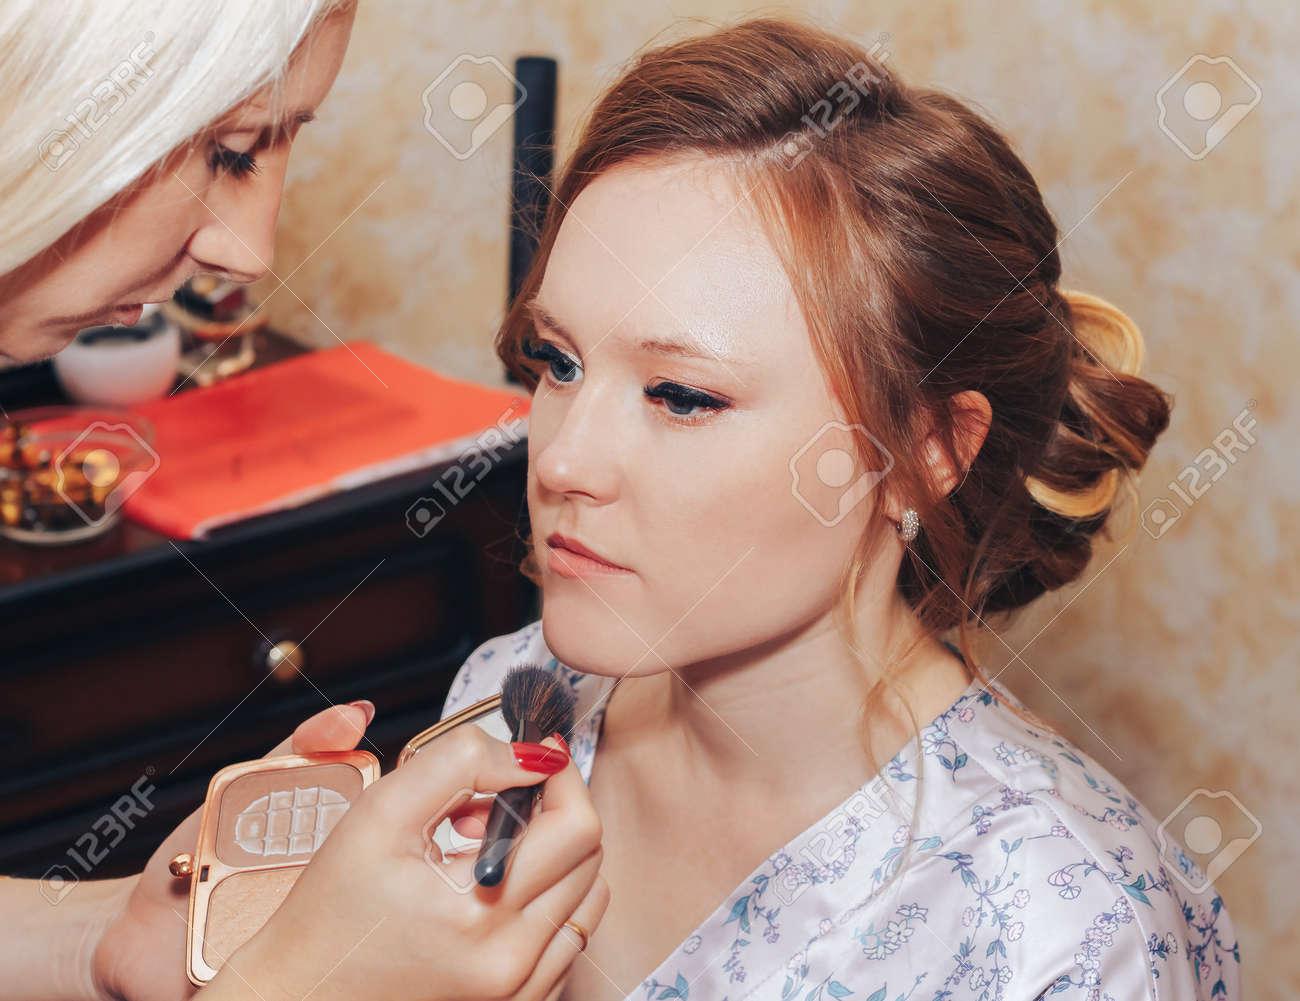 Minsk Belarus Makeup artist doing hairstyle to girl - 156649703